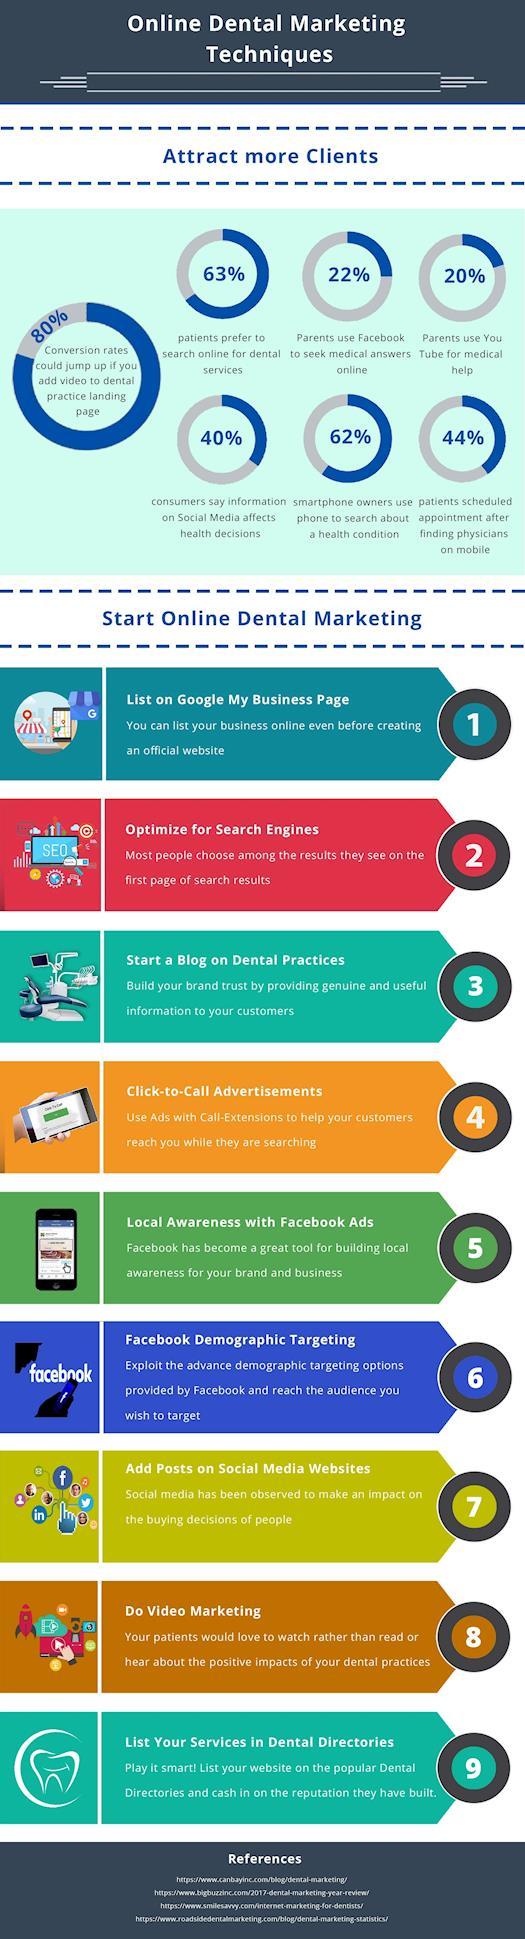 Online Dental Marketing Techniques